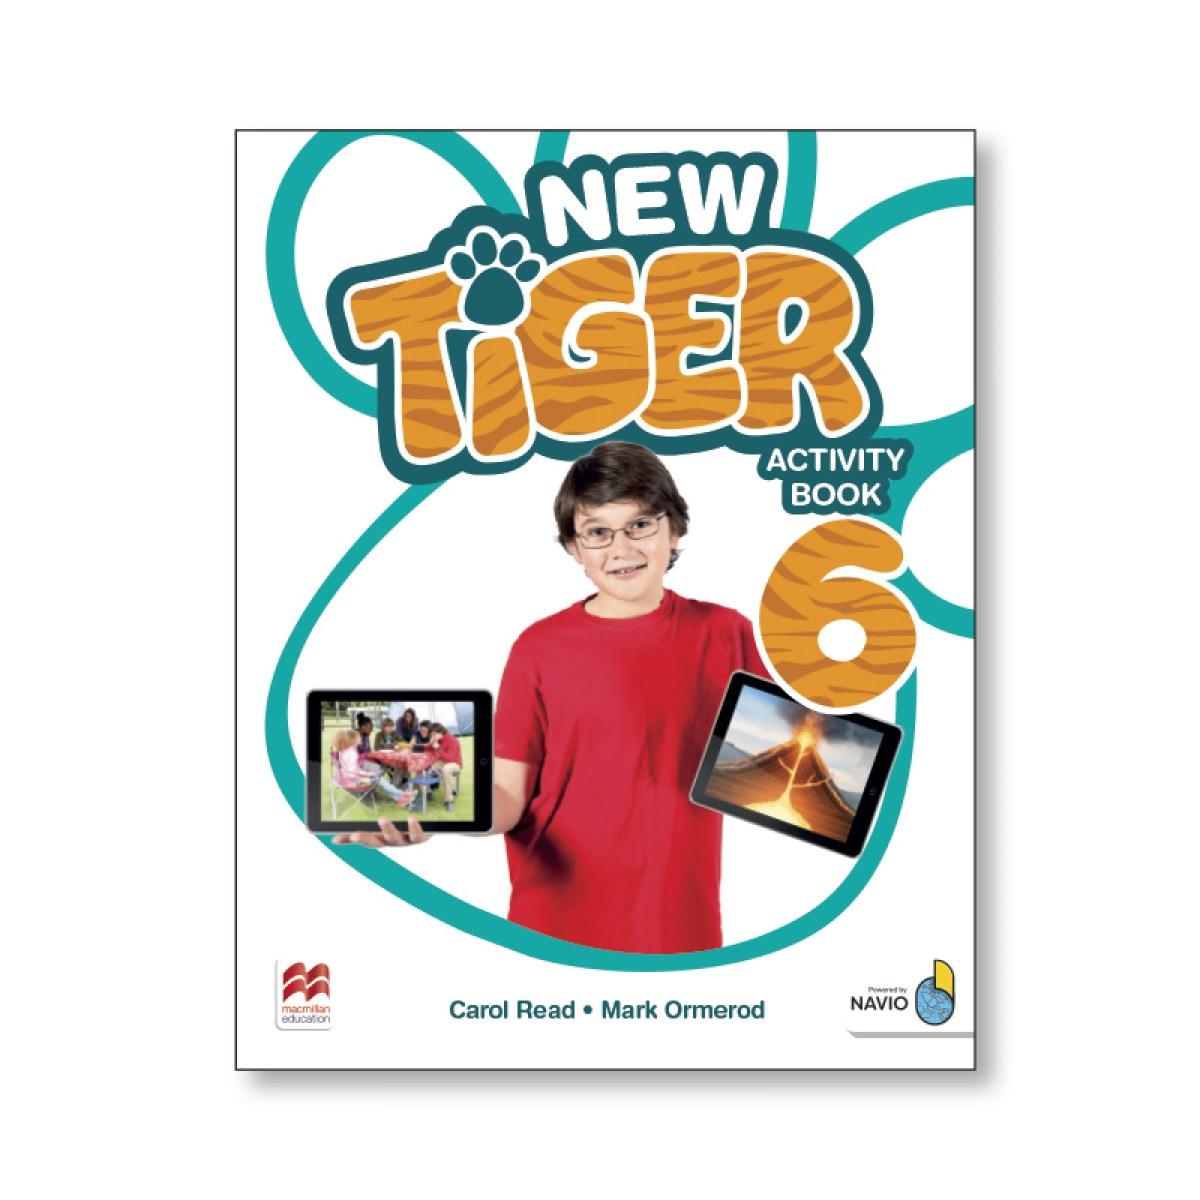 NEW TIGER ACTIVITY BOOK 6